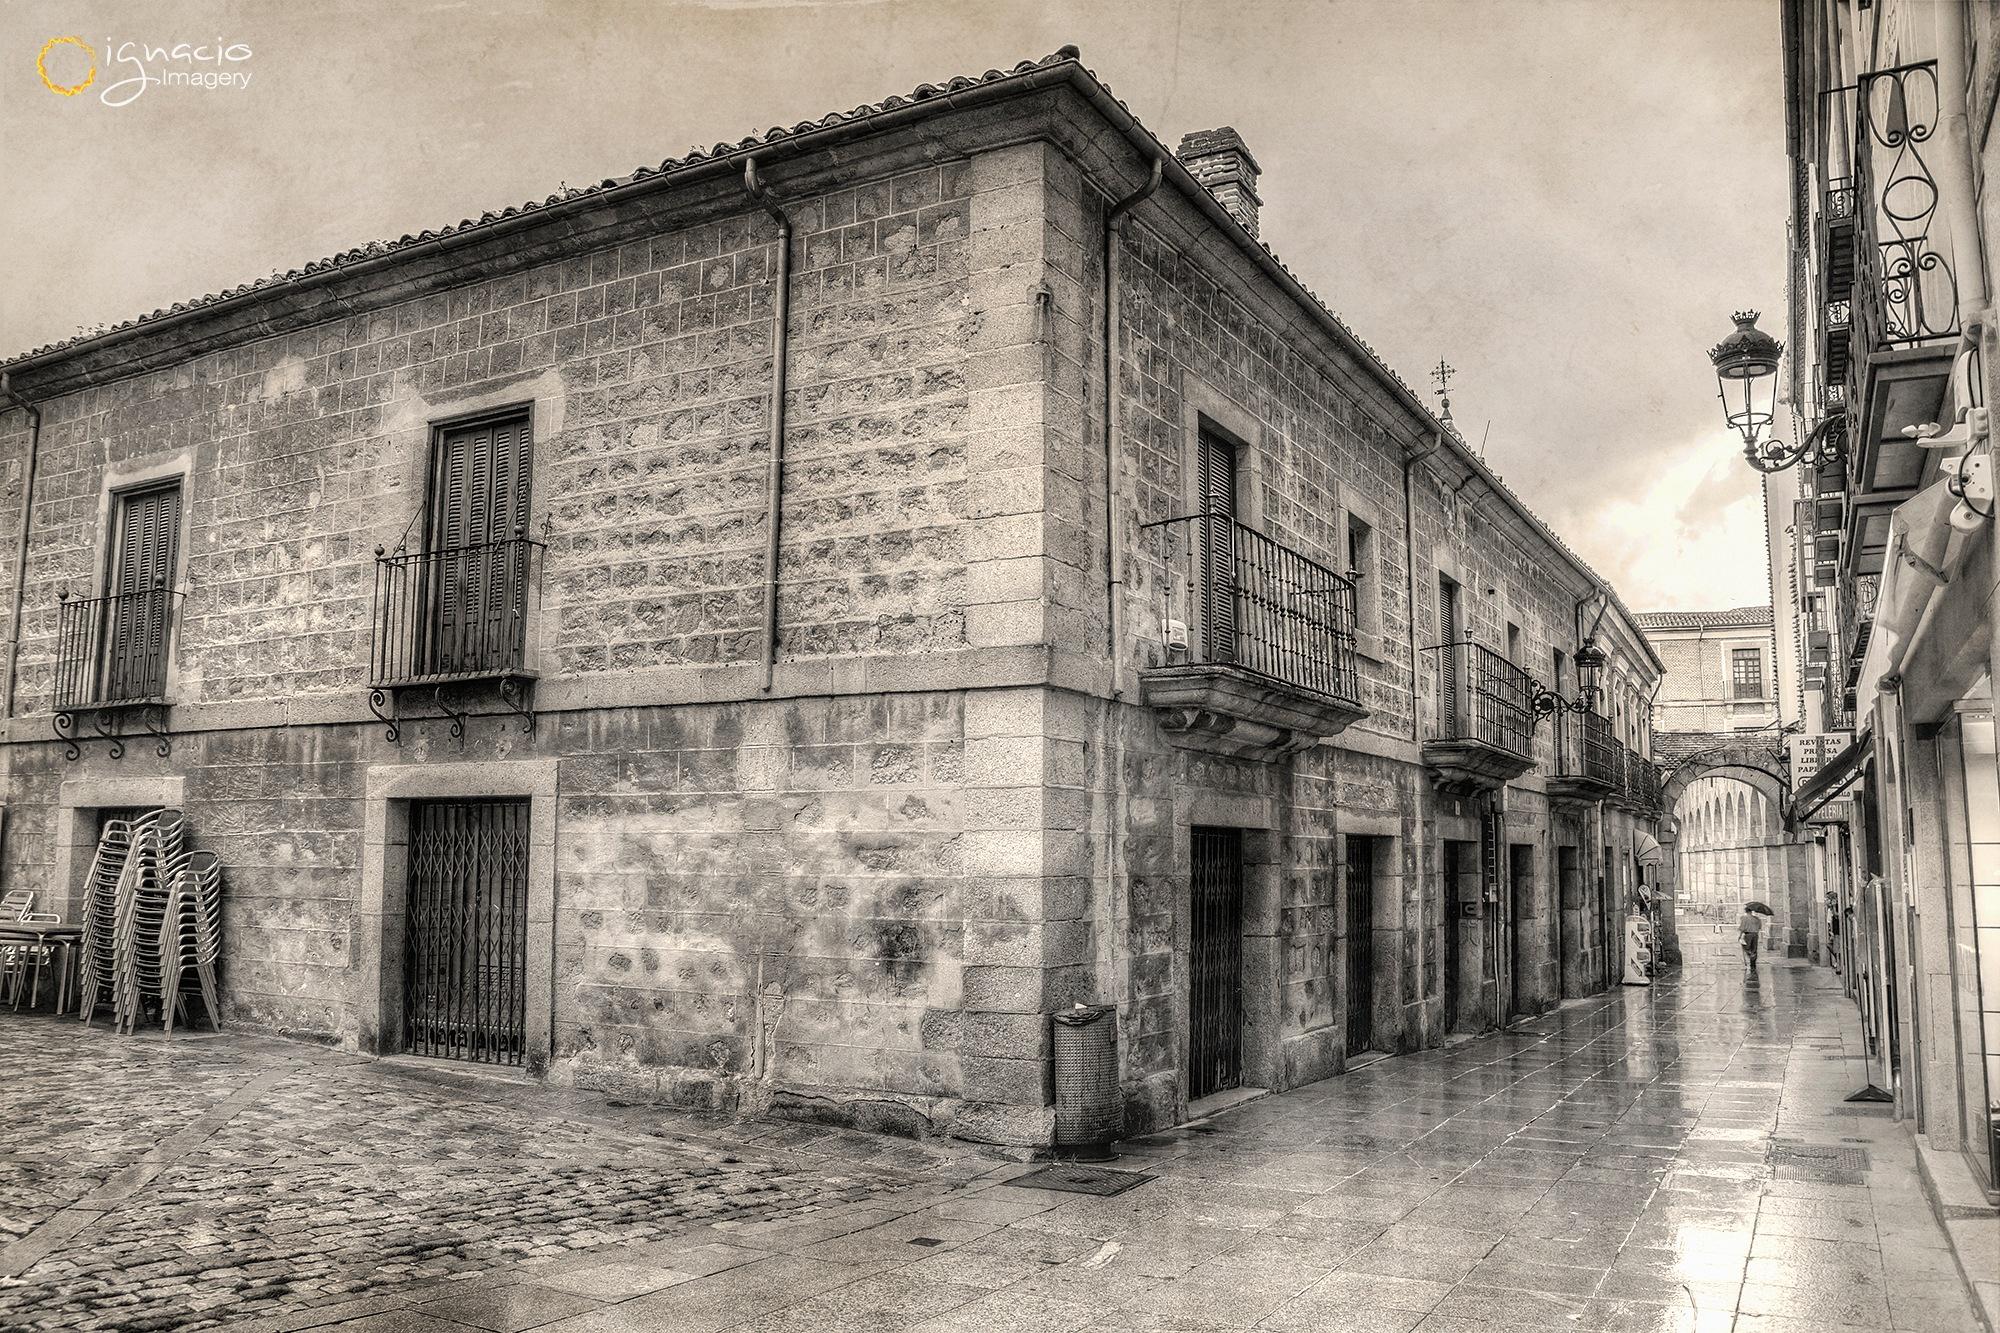 It rains over the old city by Ignacio Leal Orozco